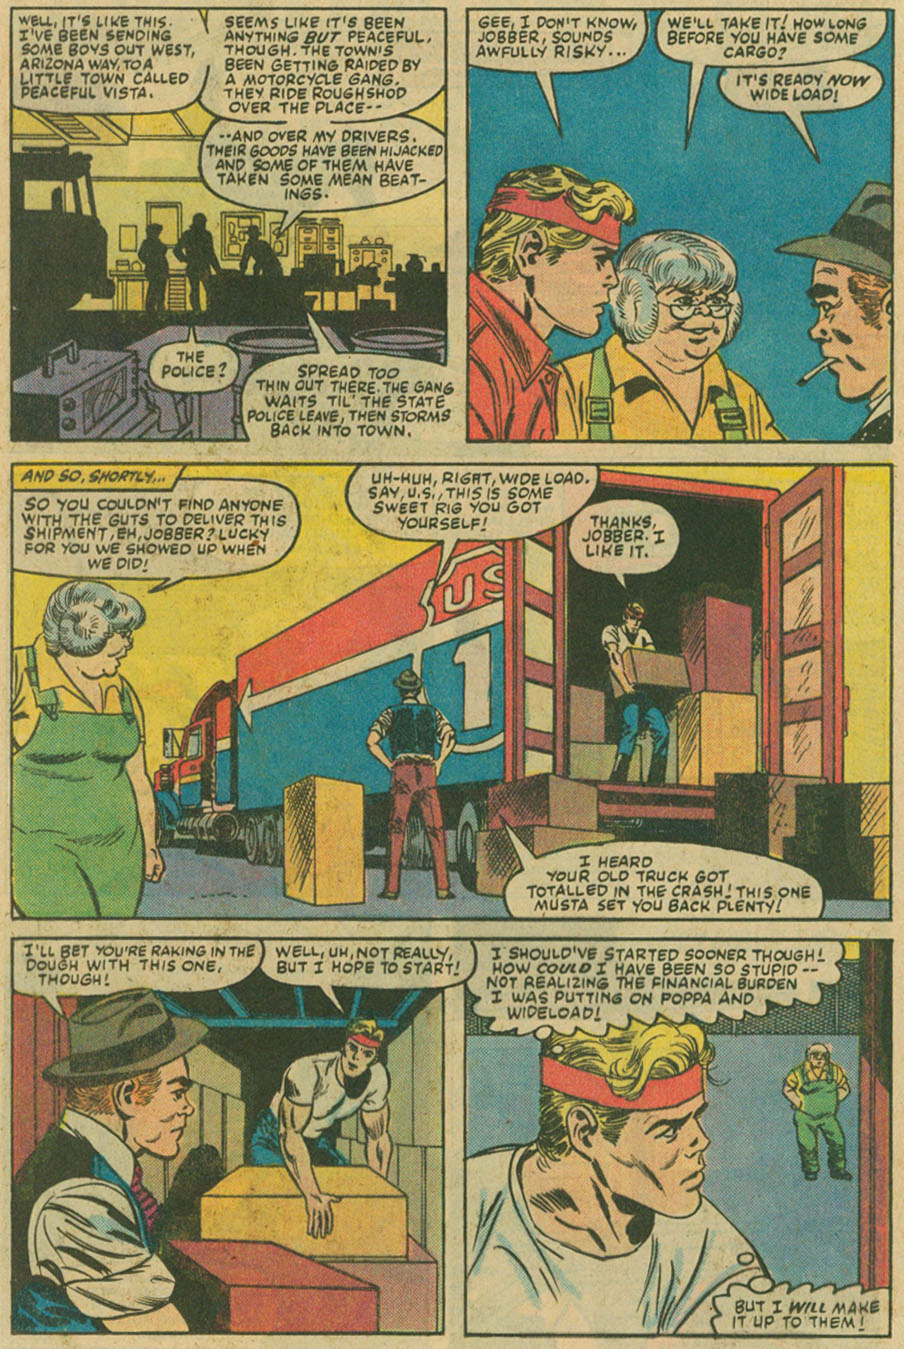 Read online U.S. 1 comic -  Issue #6 - 11